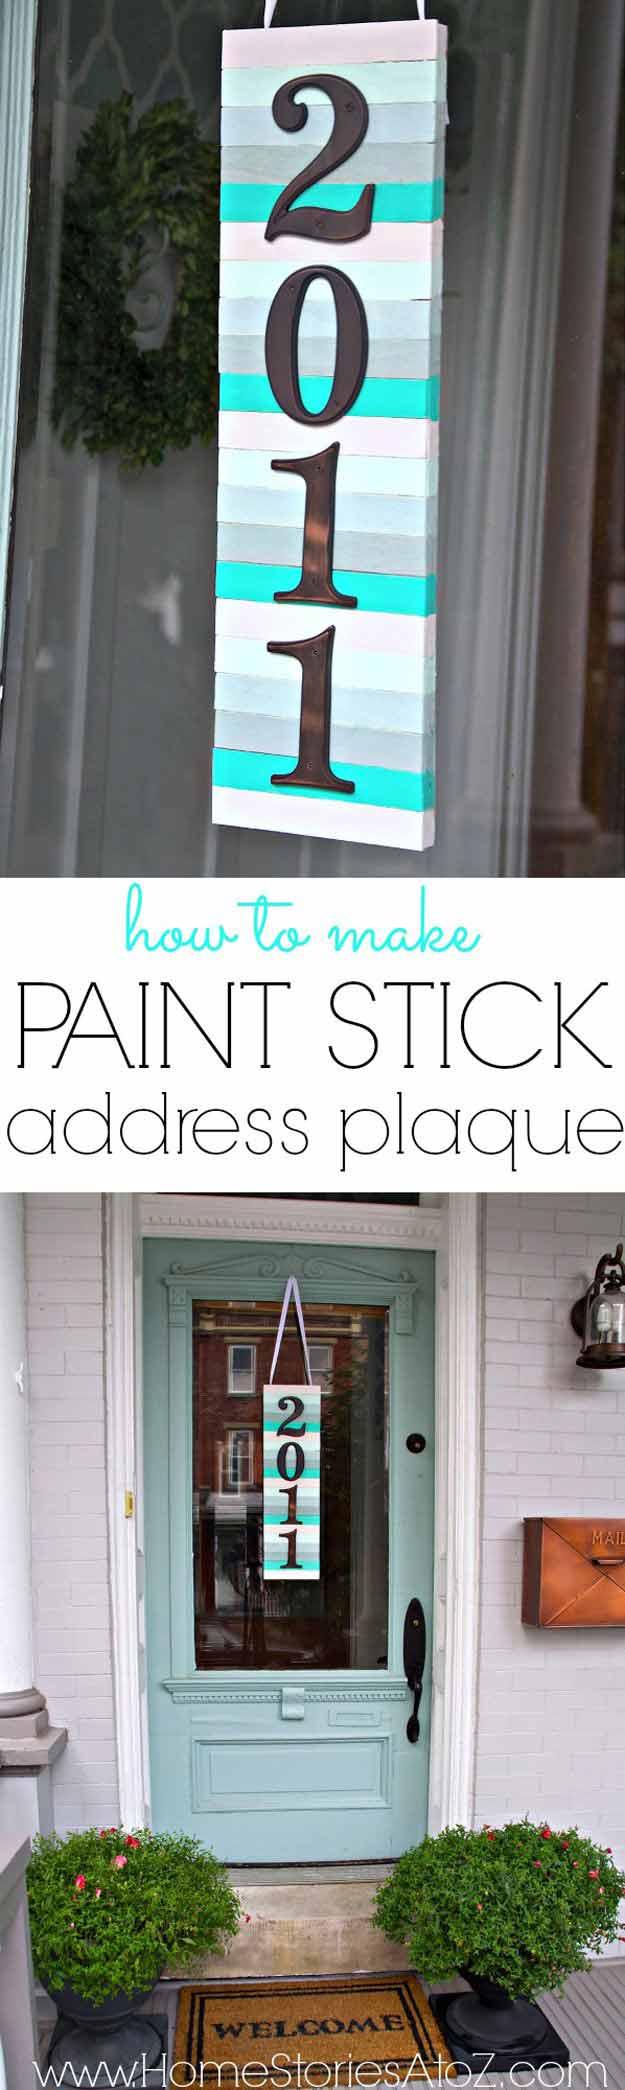 DIY Address Plaque | 17 Amazing DIY Paint Chip Projects